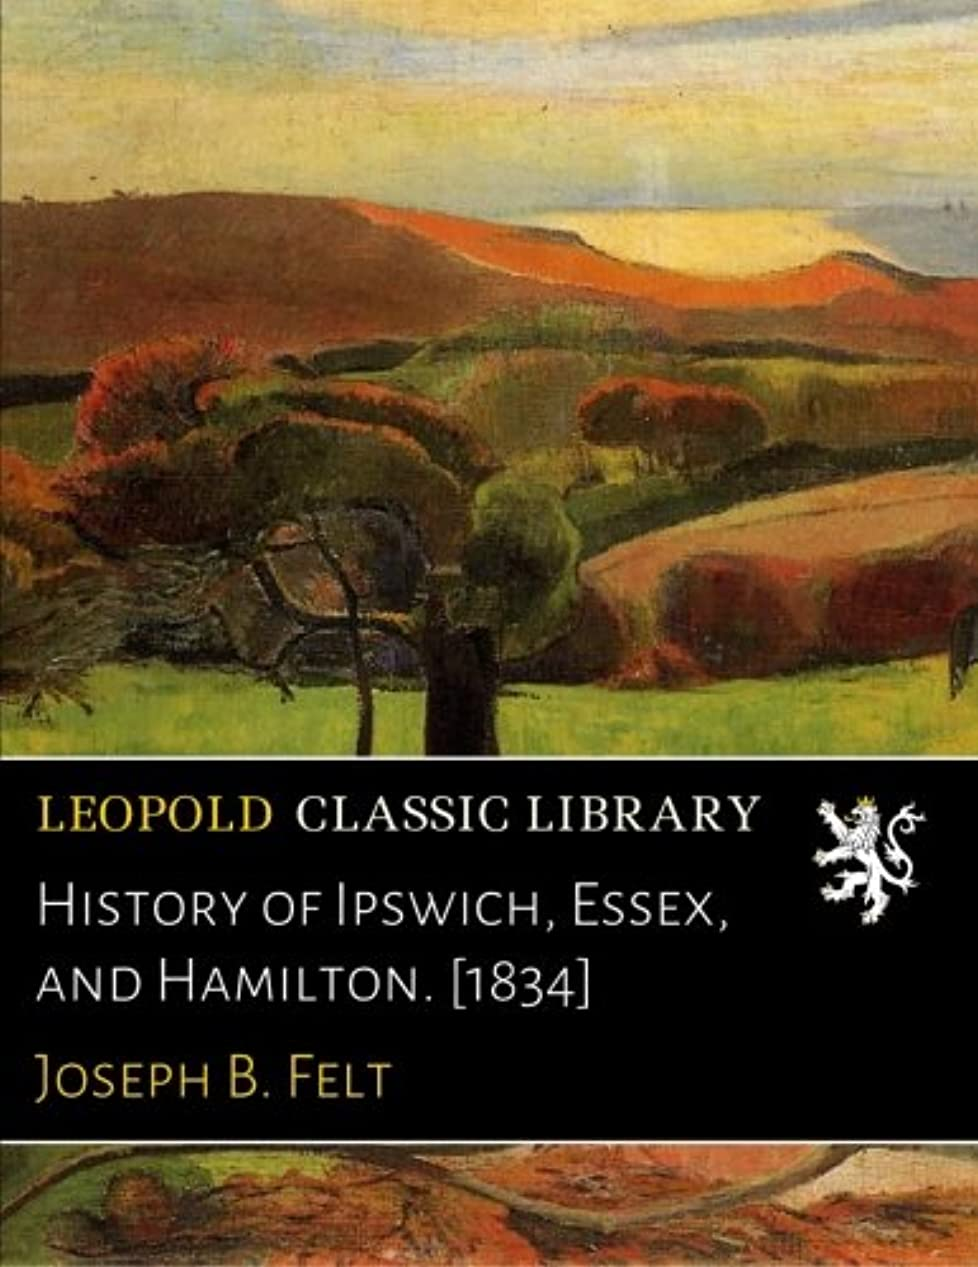 History of Ipswich, Essex, and Hamilton. [1834]